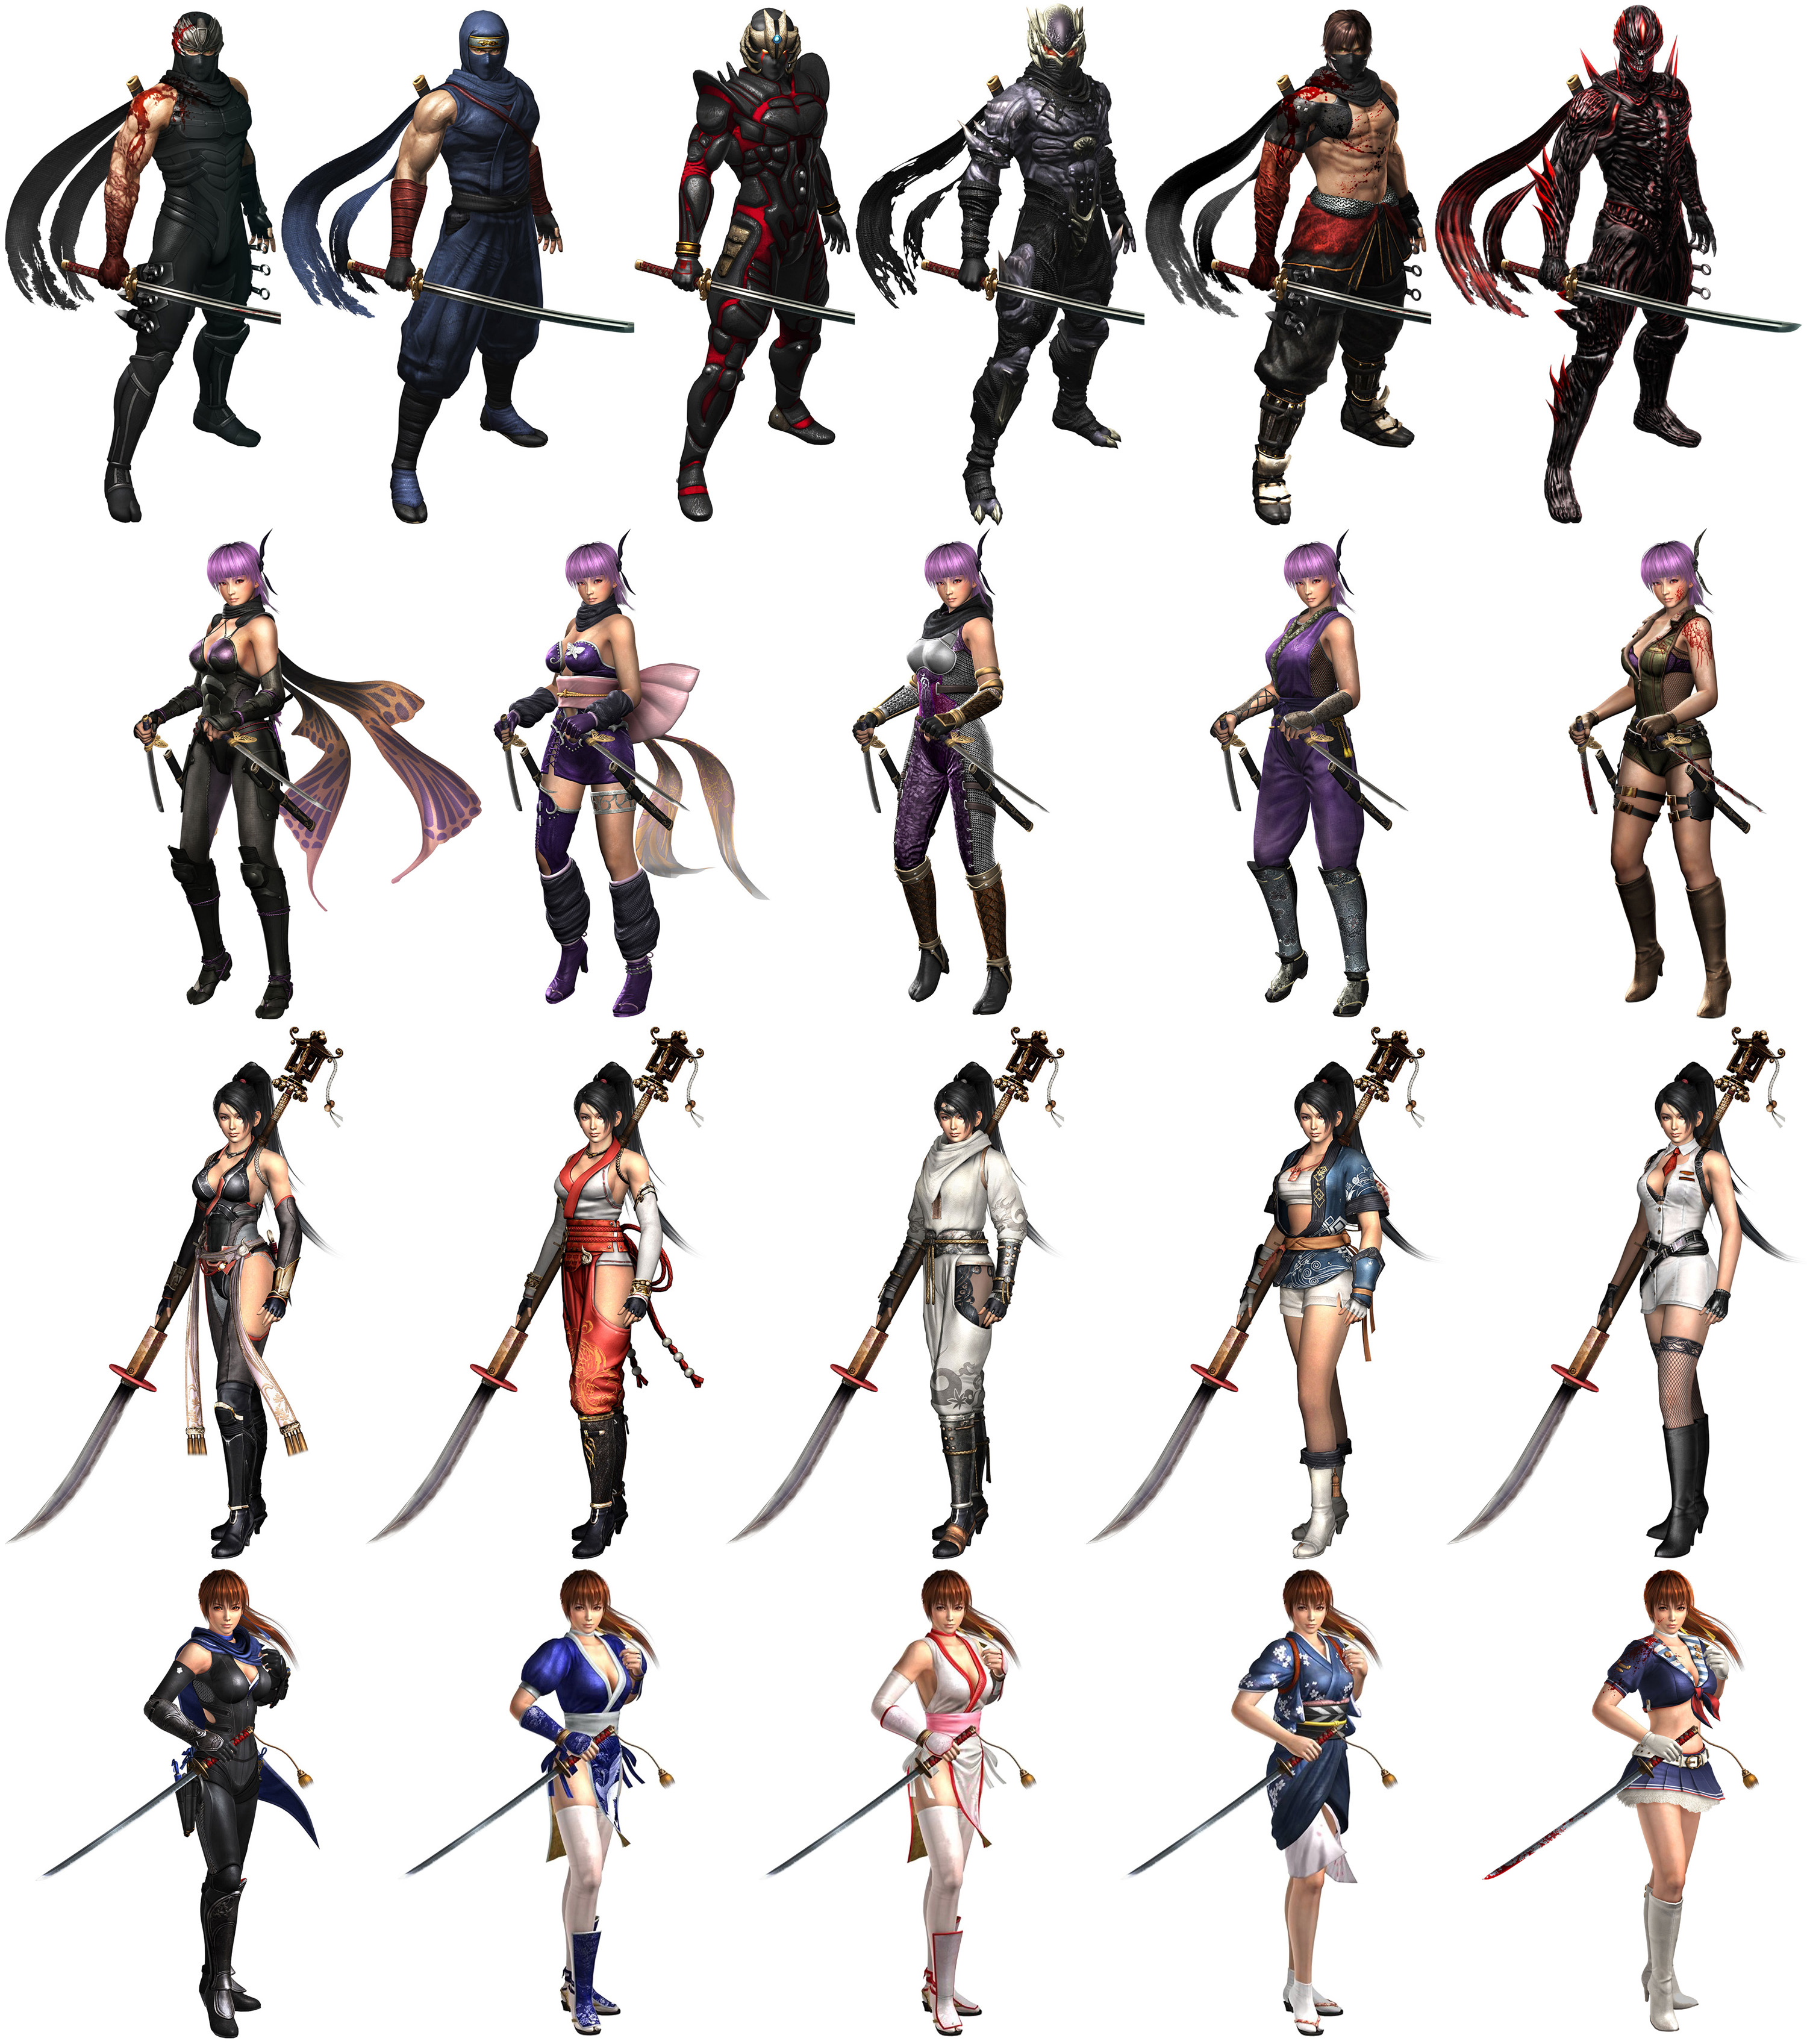 Ninja Gaiden Clans Ninja Gaiden 3 Razor's Edge